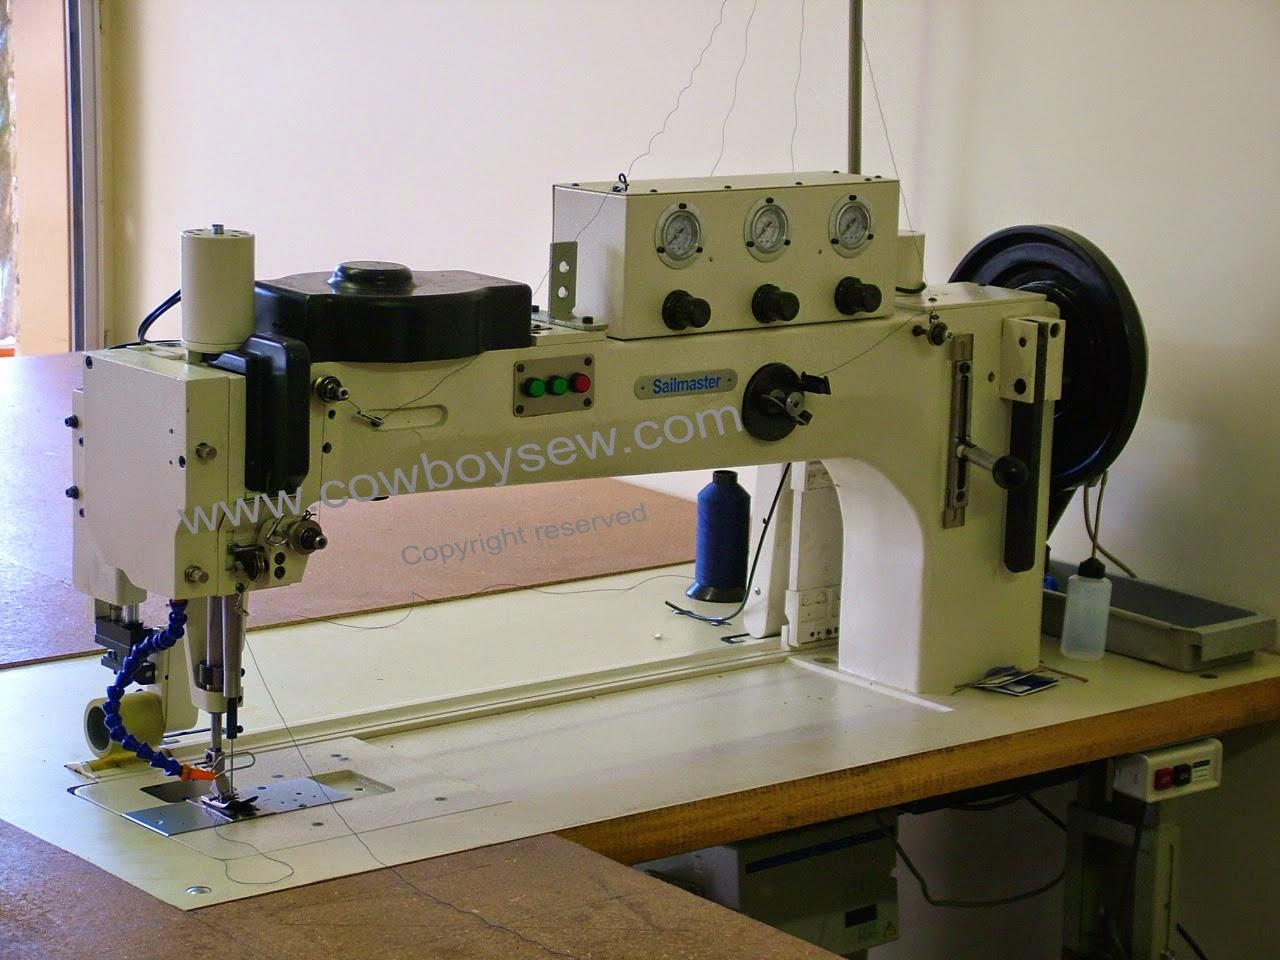 Heavy Duty Air Mattress >> Heavy duty industrial sewing machines: Adler 366 type long ...